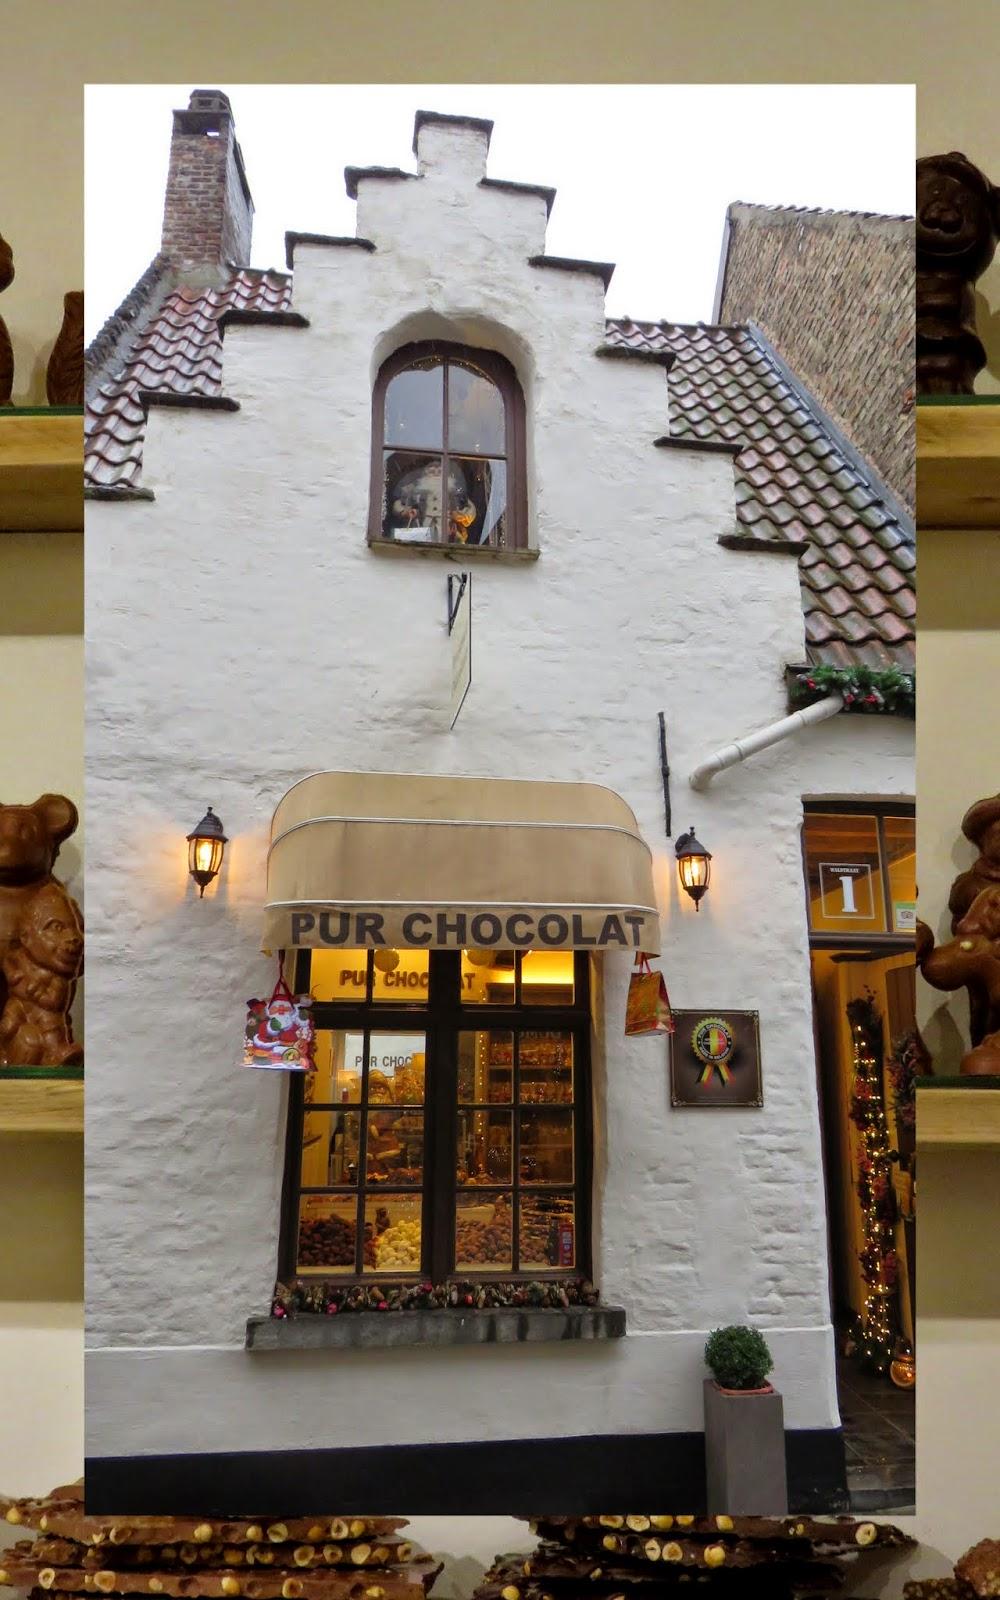 Pur Chocolat Shop in Bruges